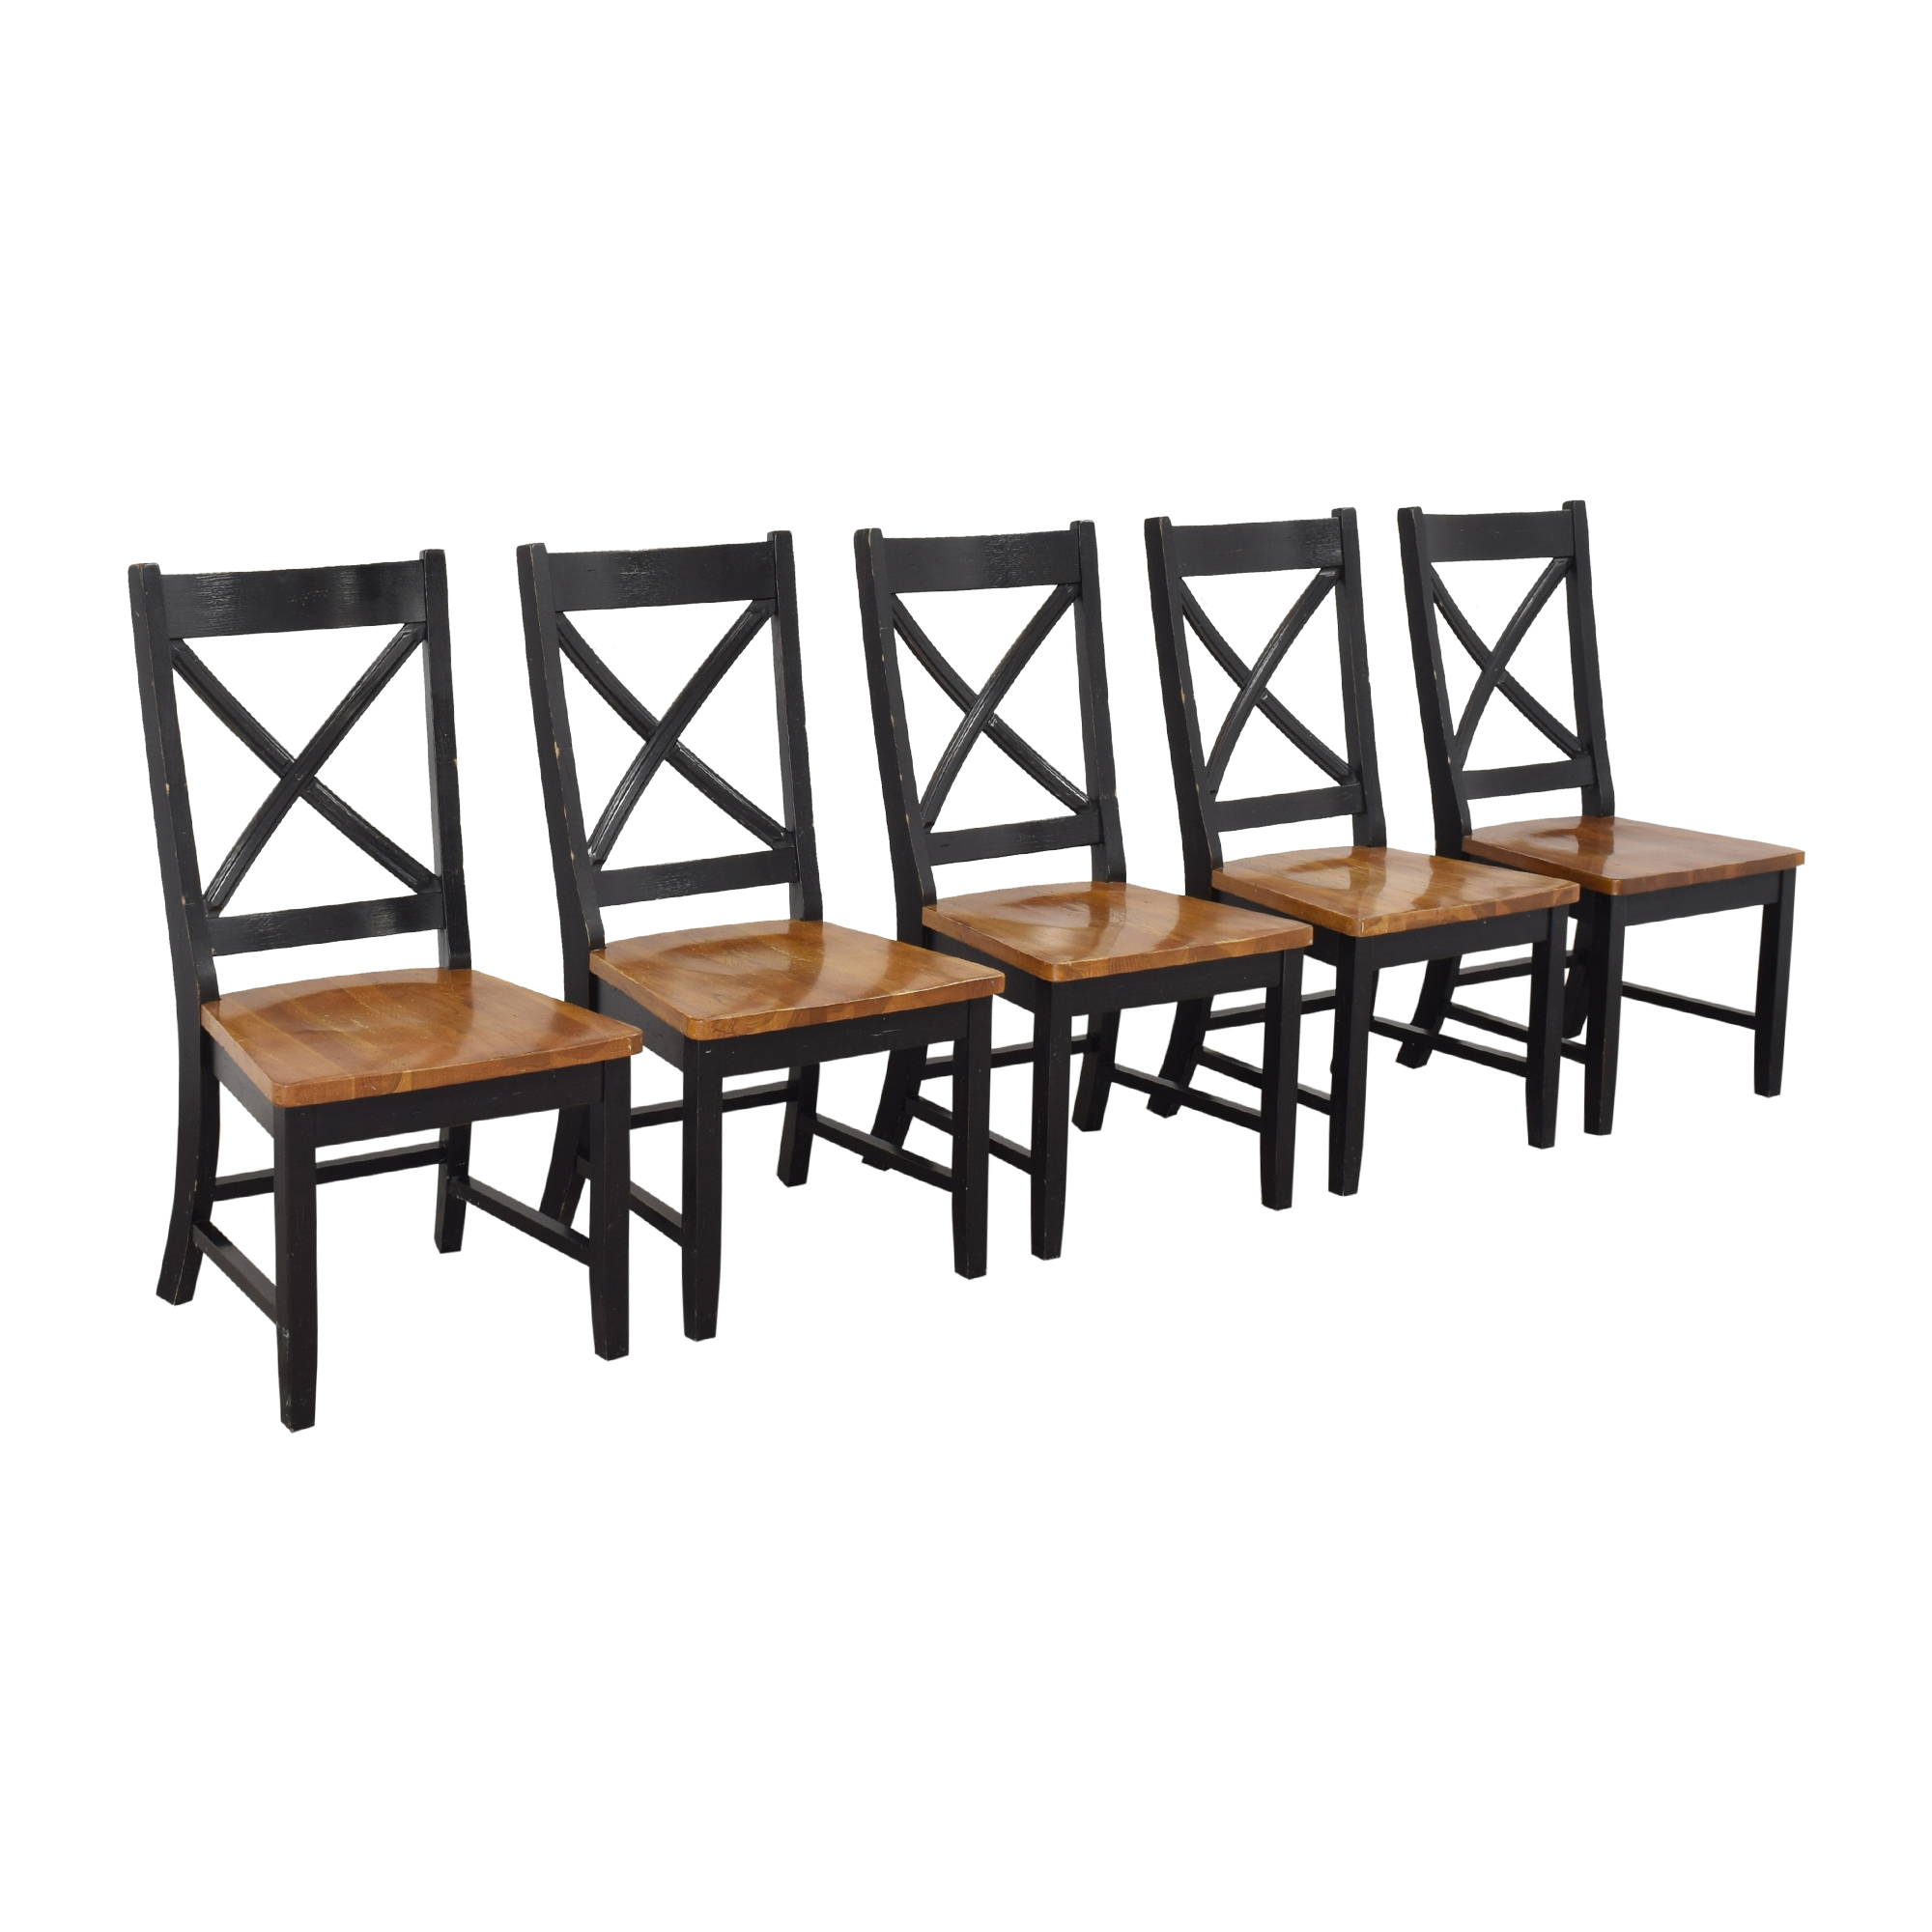 Havertys Havertys Timber Ridge Dining Chairs coupon